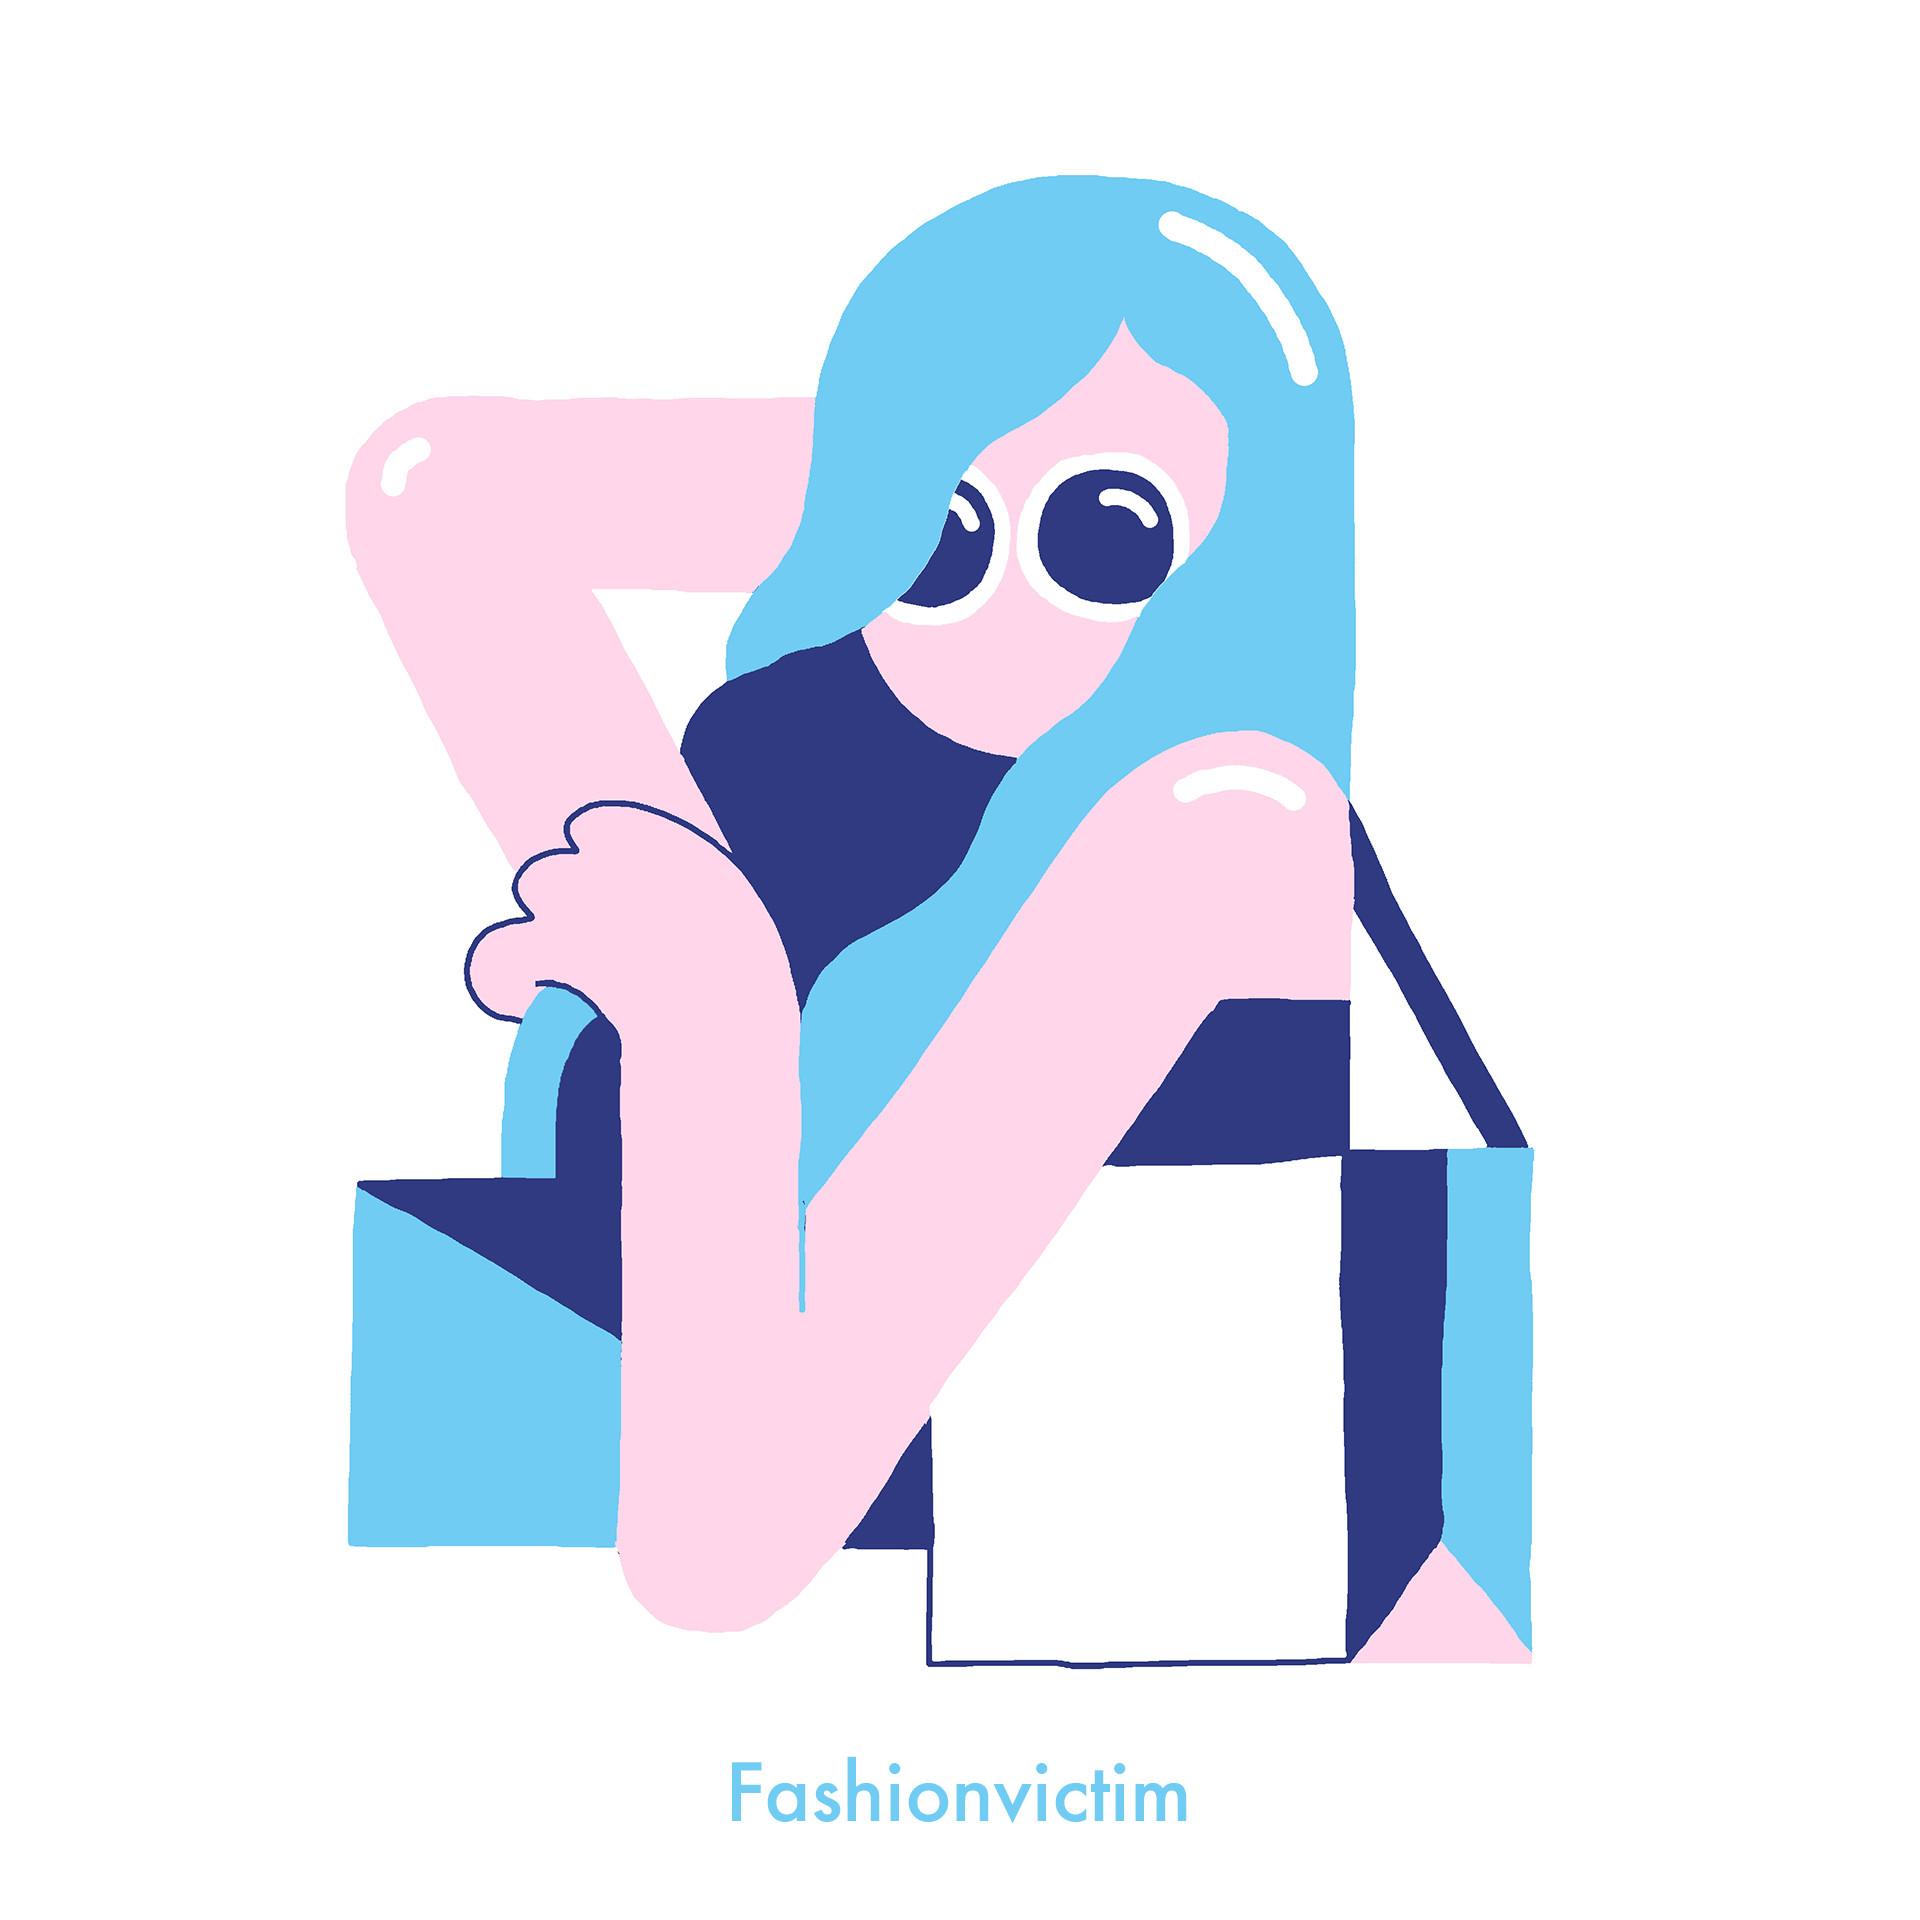 FashionvictimW.jpg